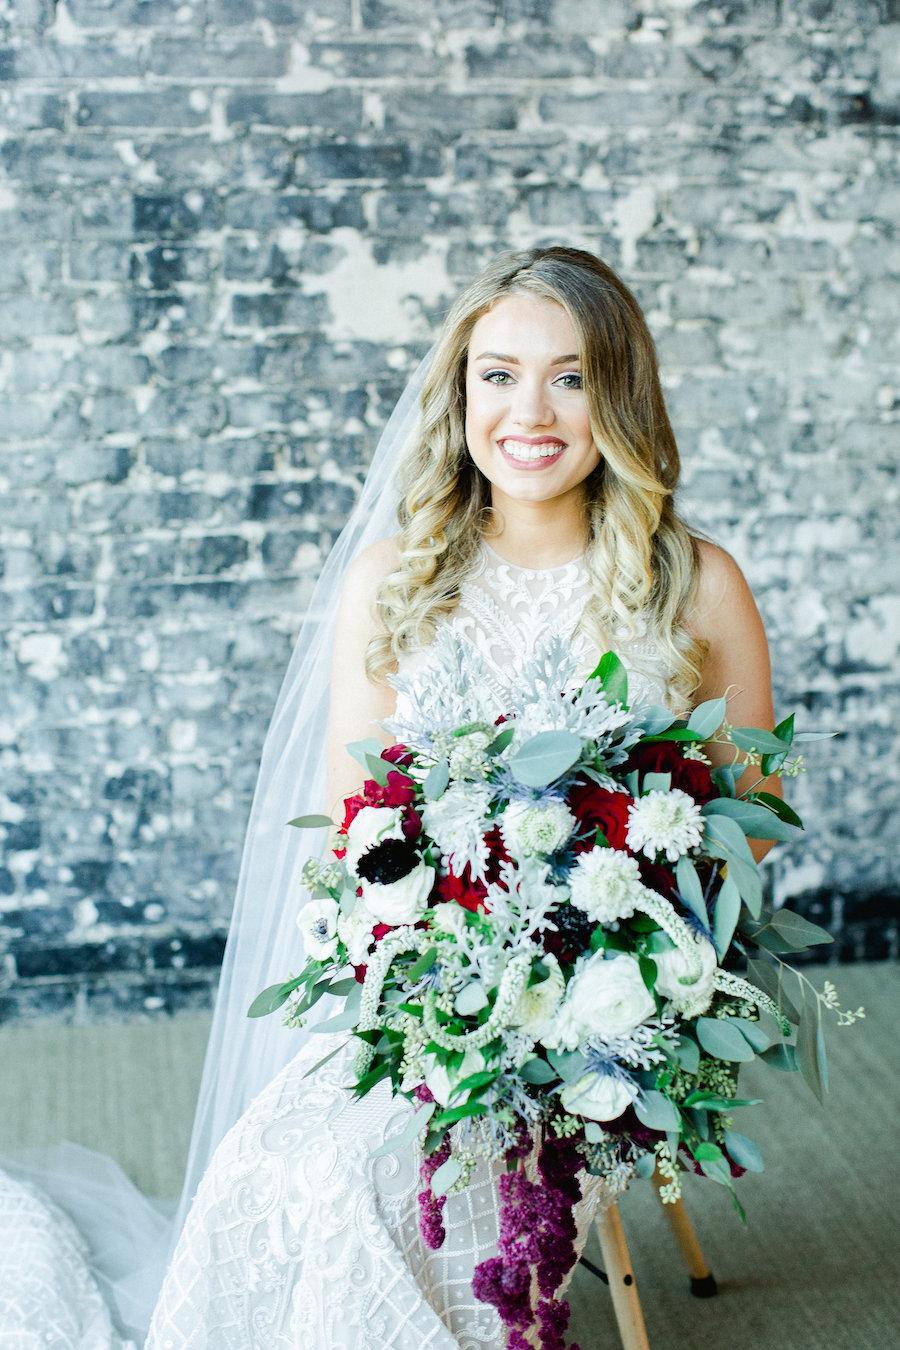 Oversized fall wedding bouquet